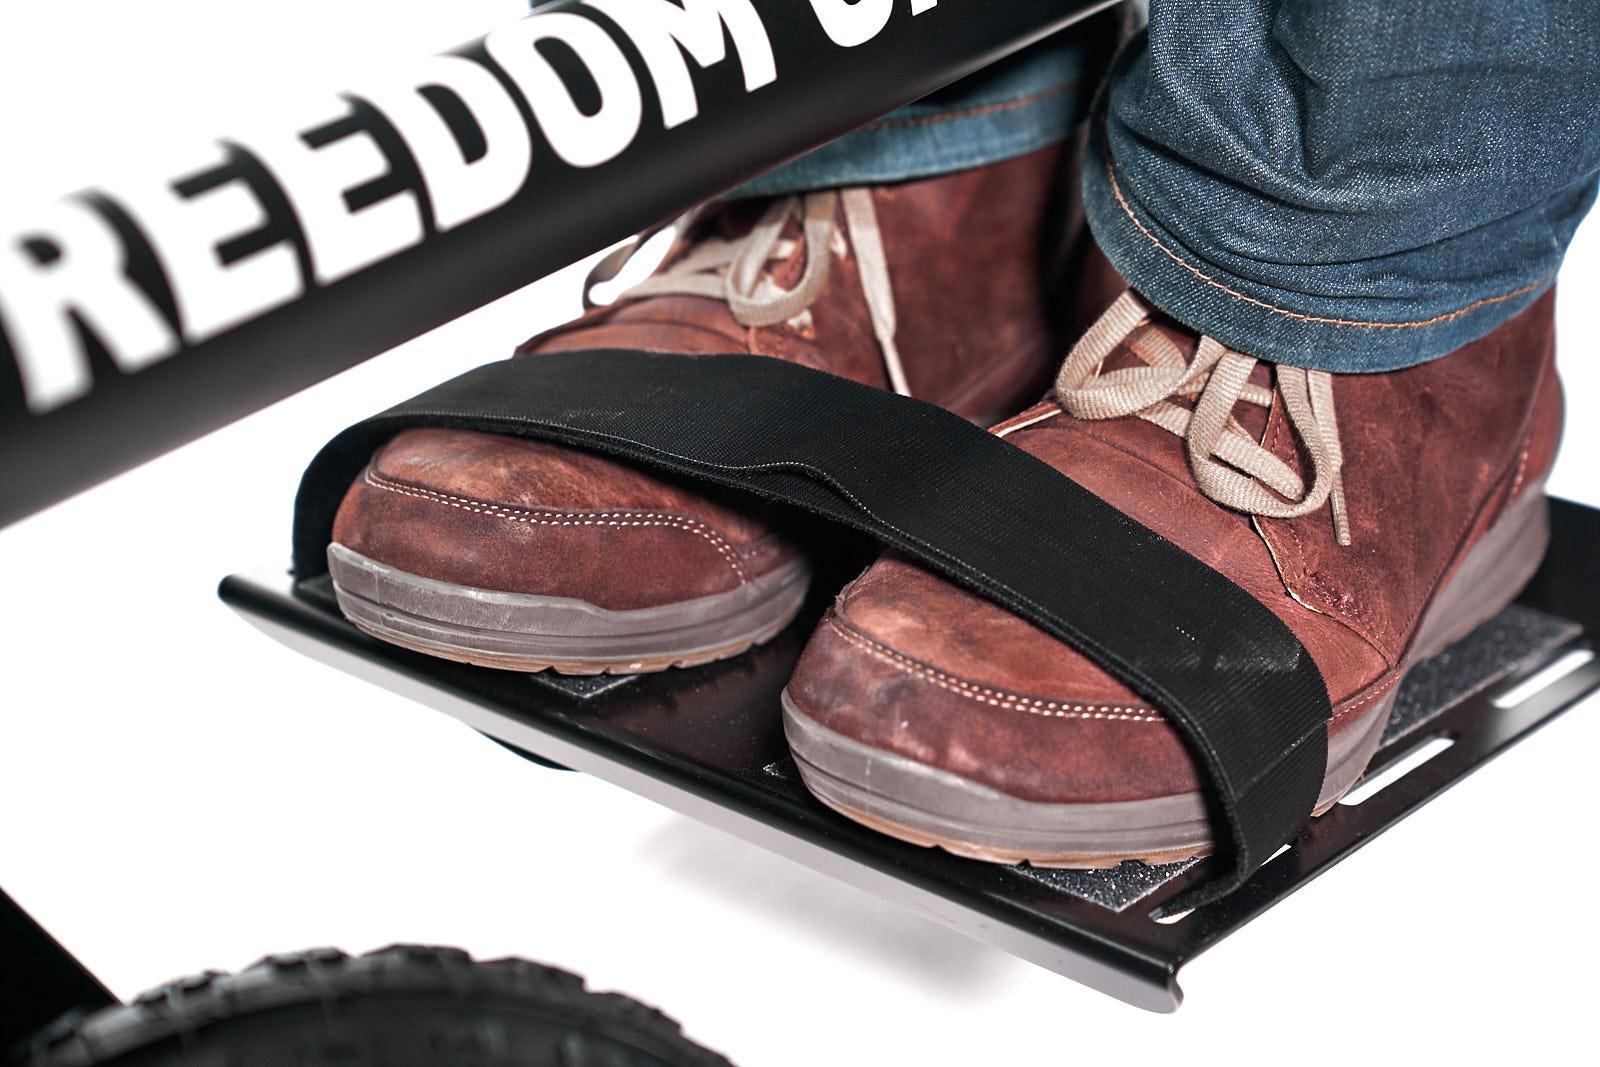 Footplate+with+strap+and+sneaks.jpg